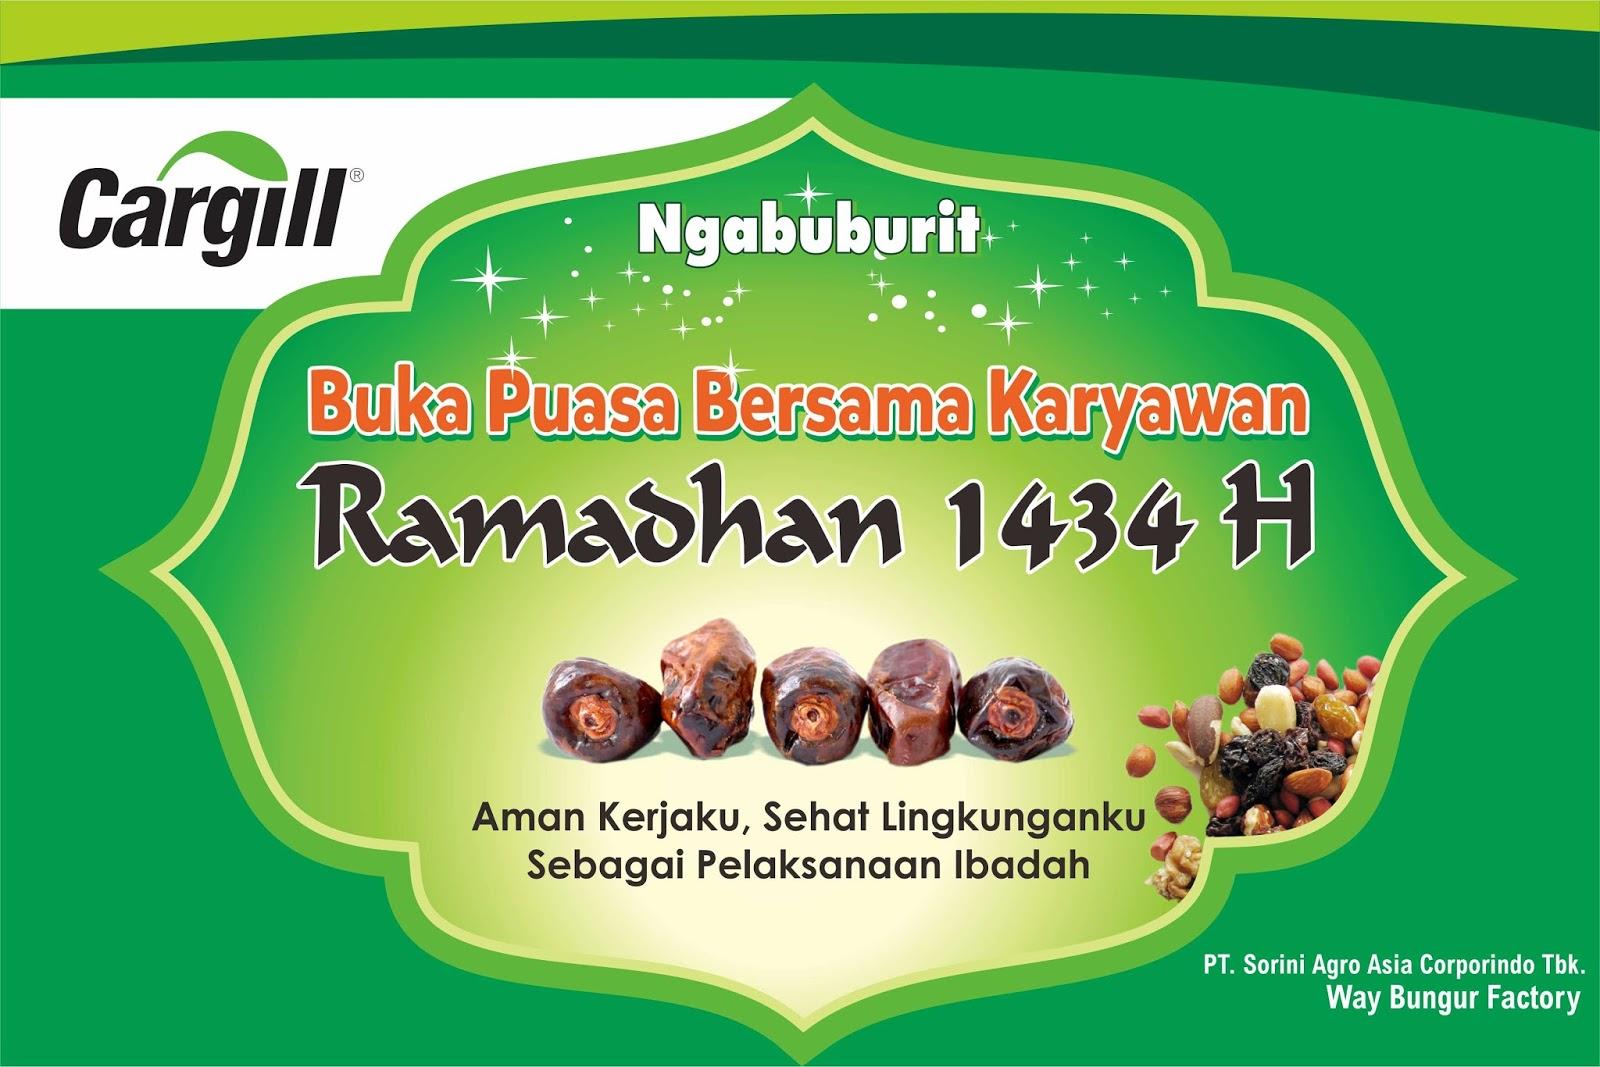 Desain Buka Puasa Bersama Ngabuburit